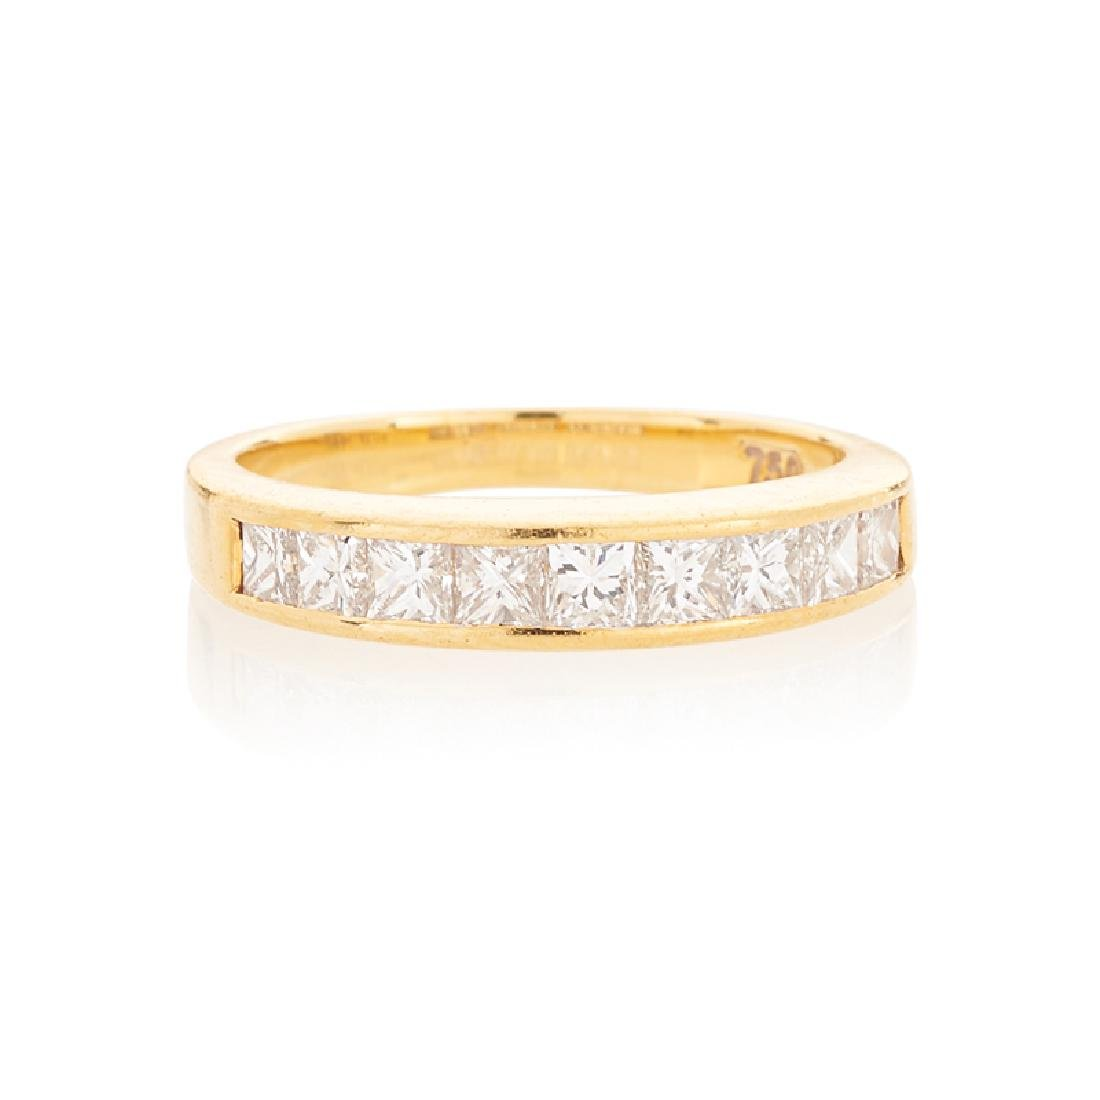 TIFFANY & CO. DIAMOND & YELLOW GOLD BAND RING